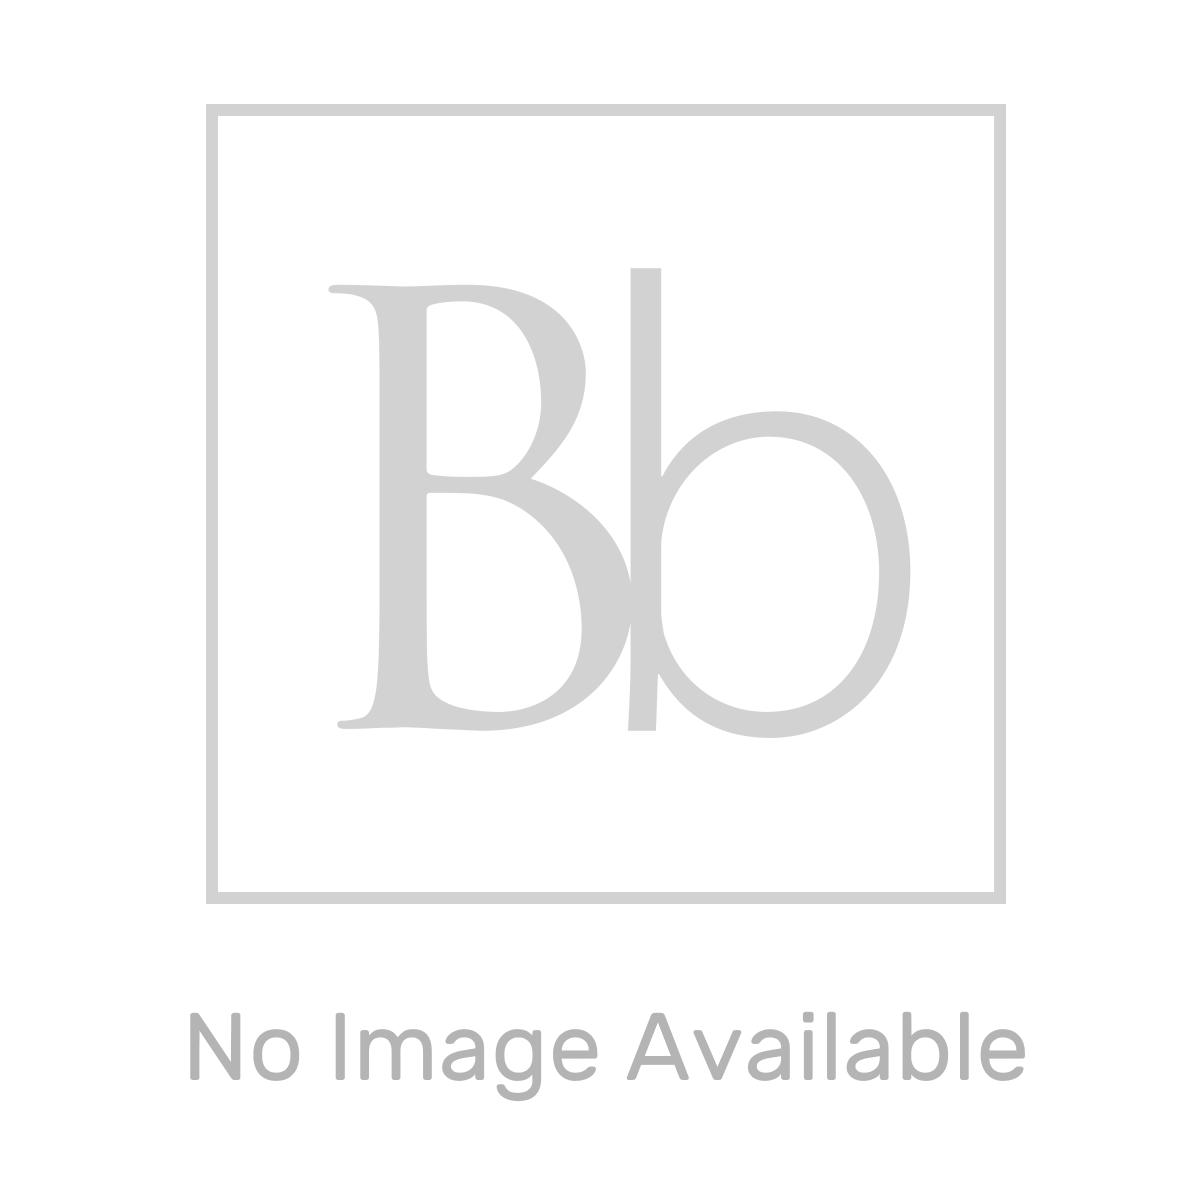 HiB Orb 50 LED Steam Free Bathroom Mirror